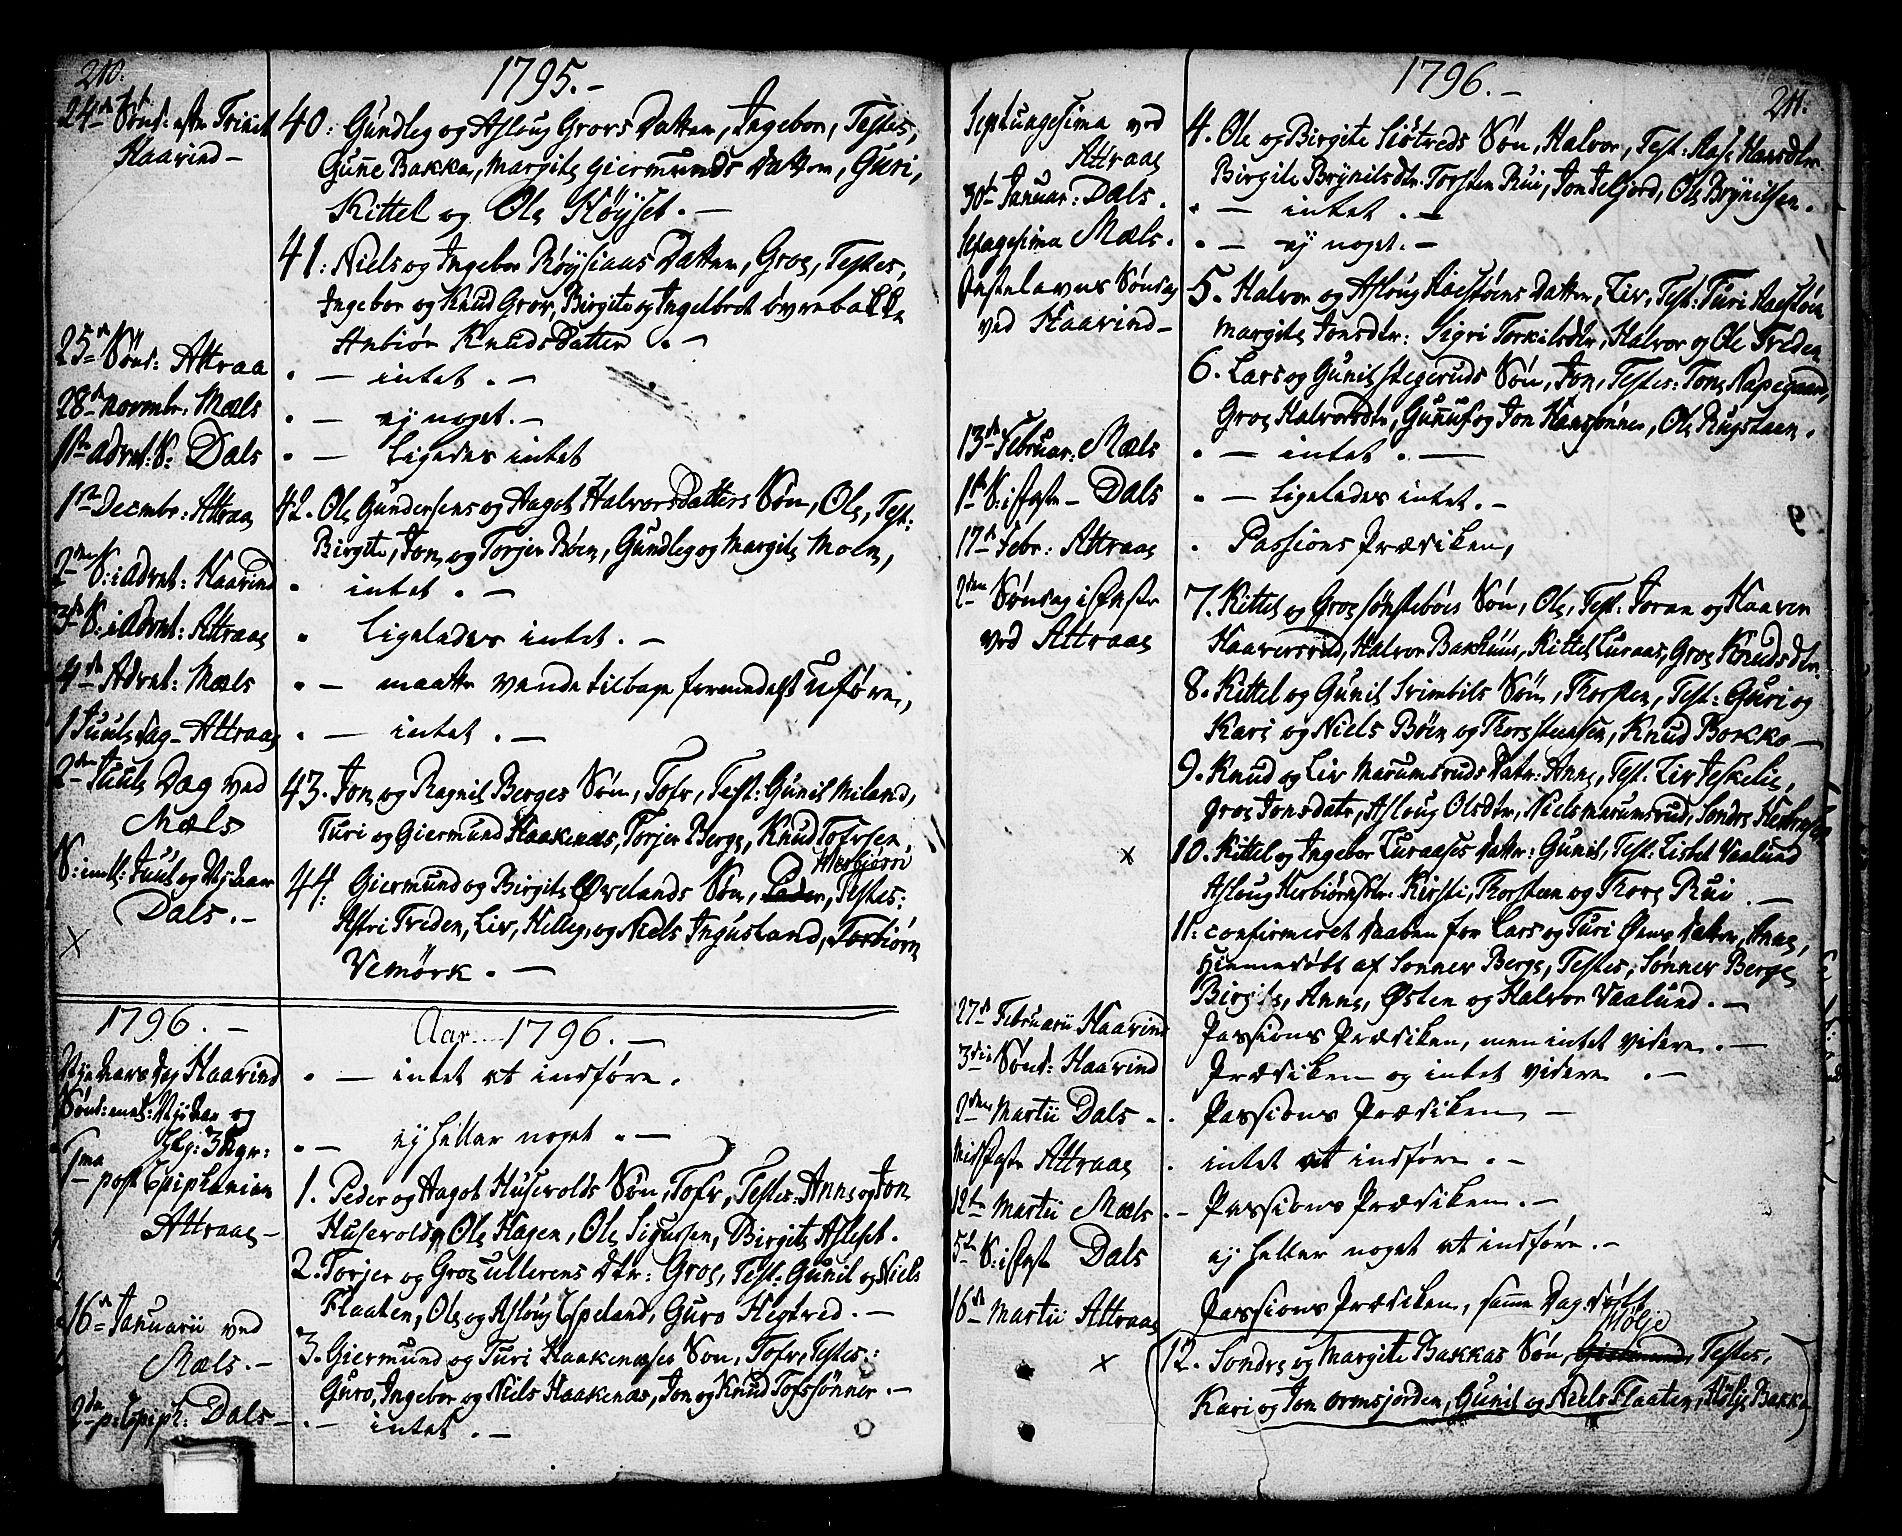 SAKO, Tinn kirkebøker, F/Fa/L0002: Ministerialbok nr. I 2, 1757-1810, s. 210-211